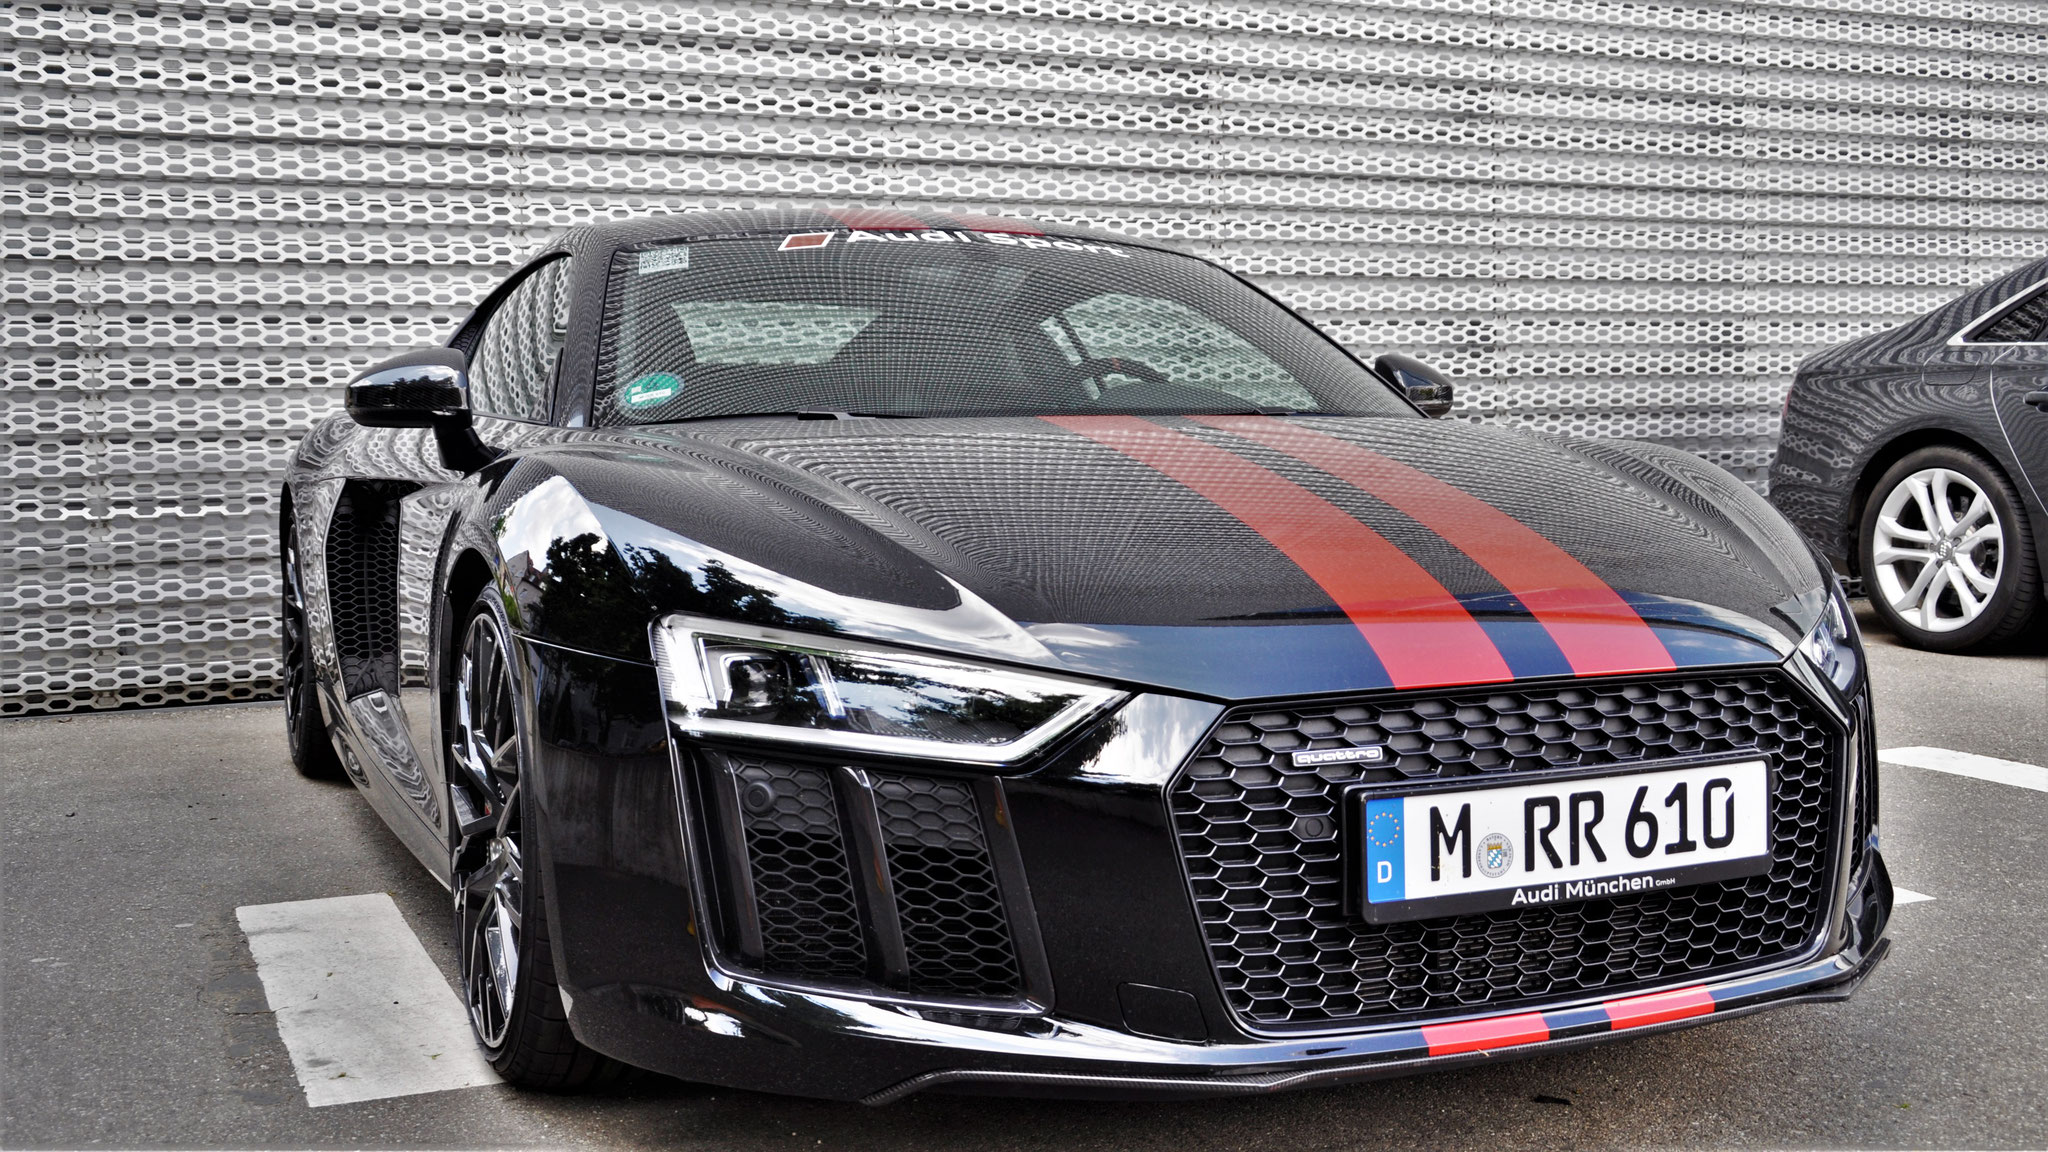 Audi R8 V10 - M-RR-610